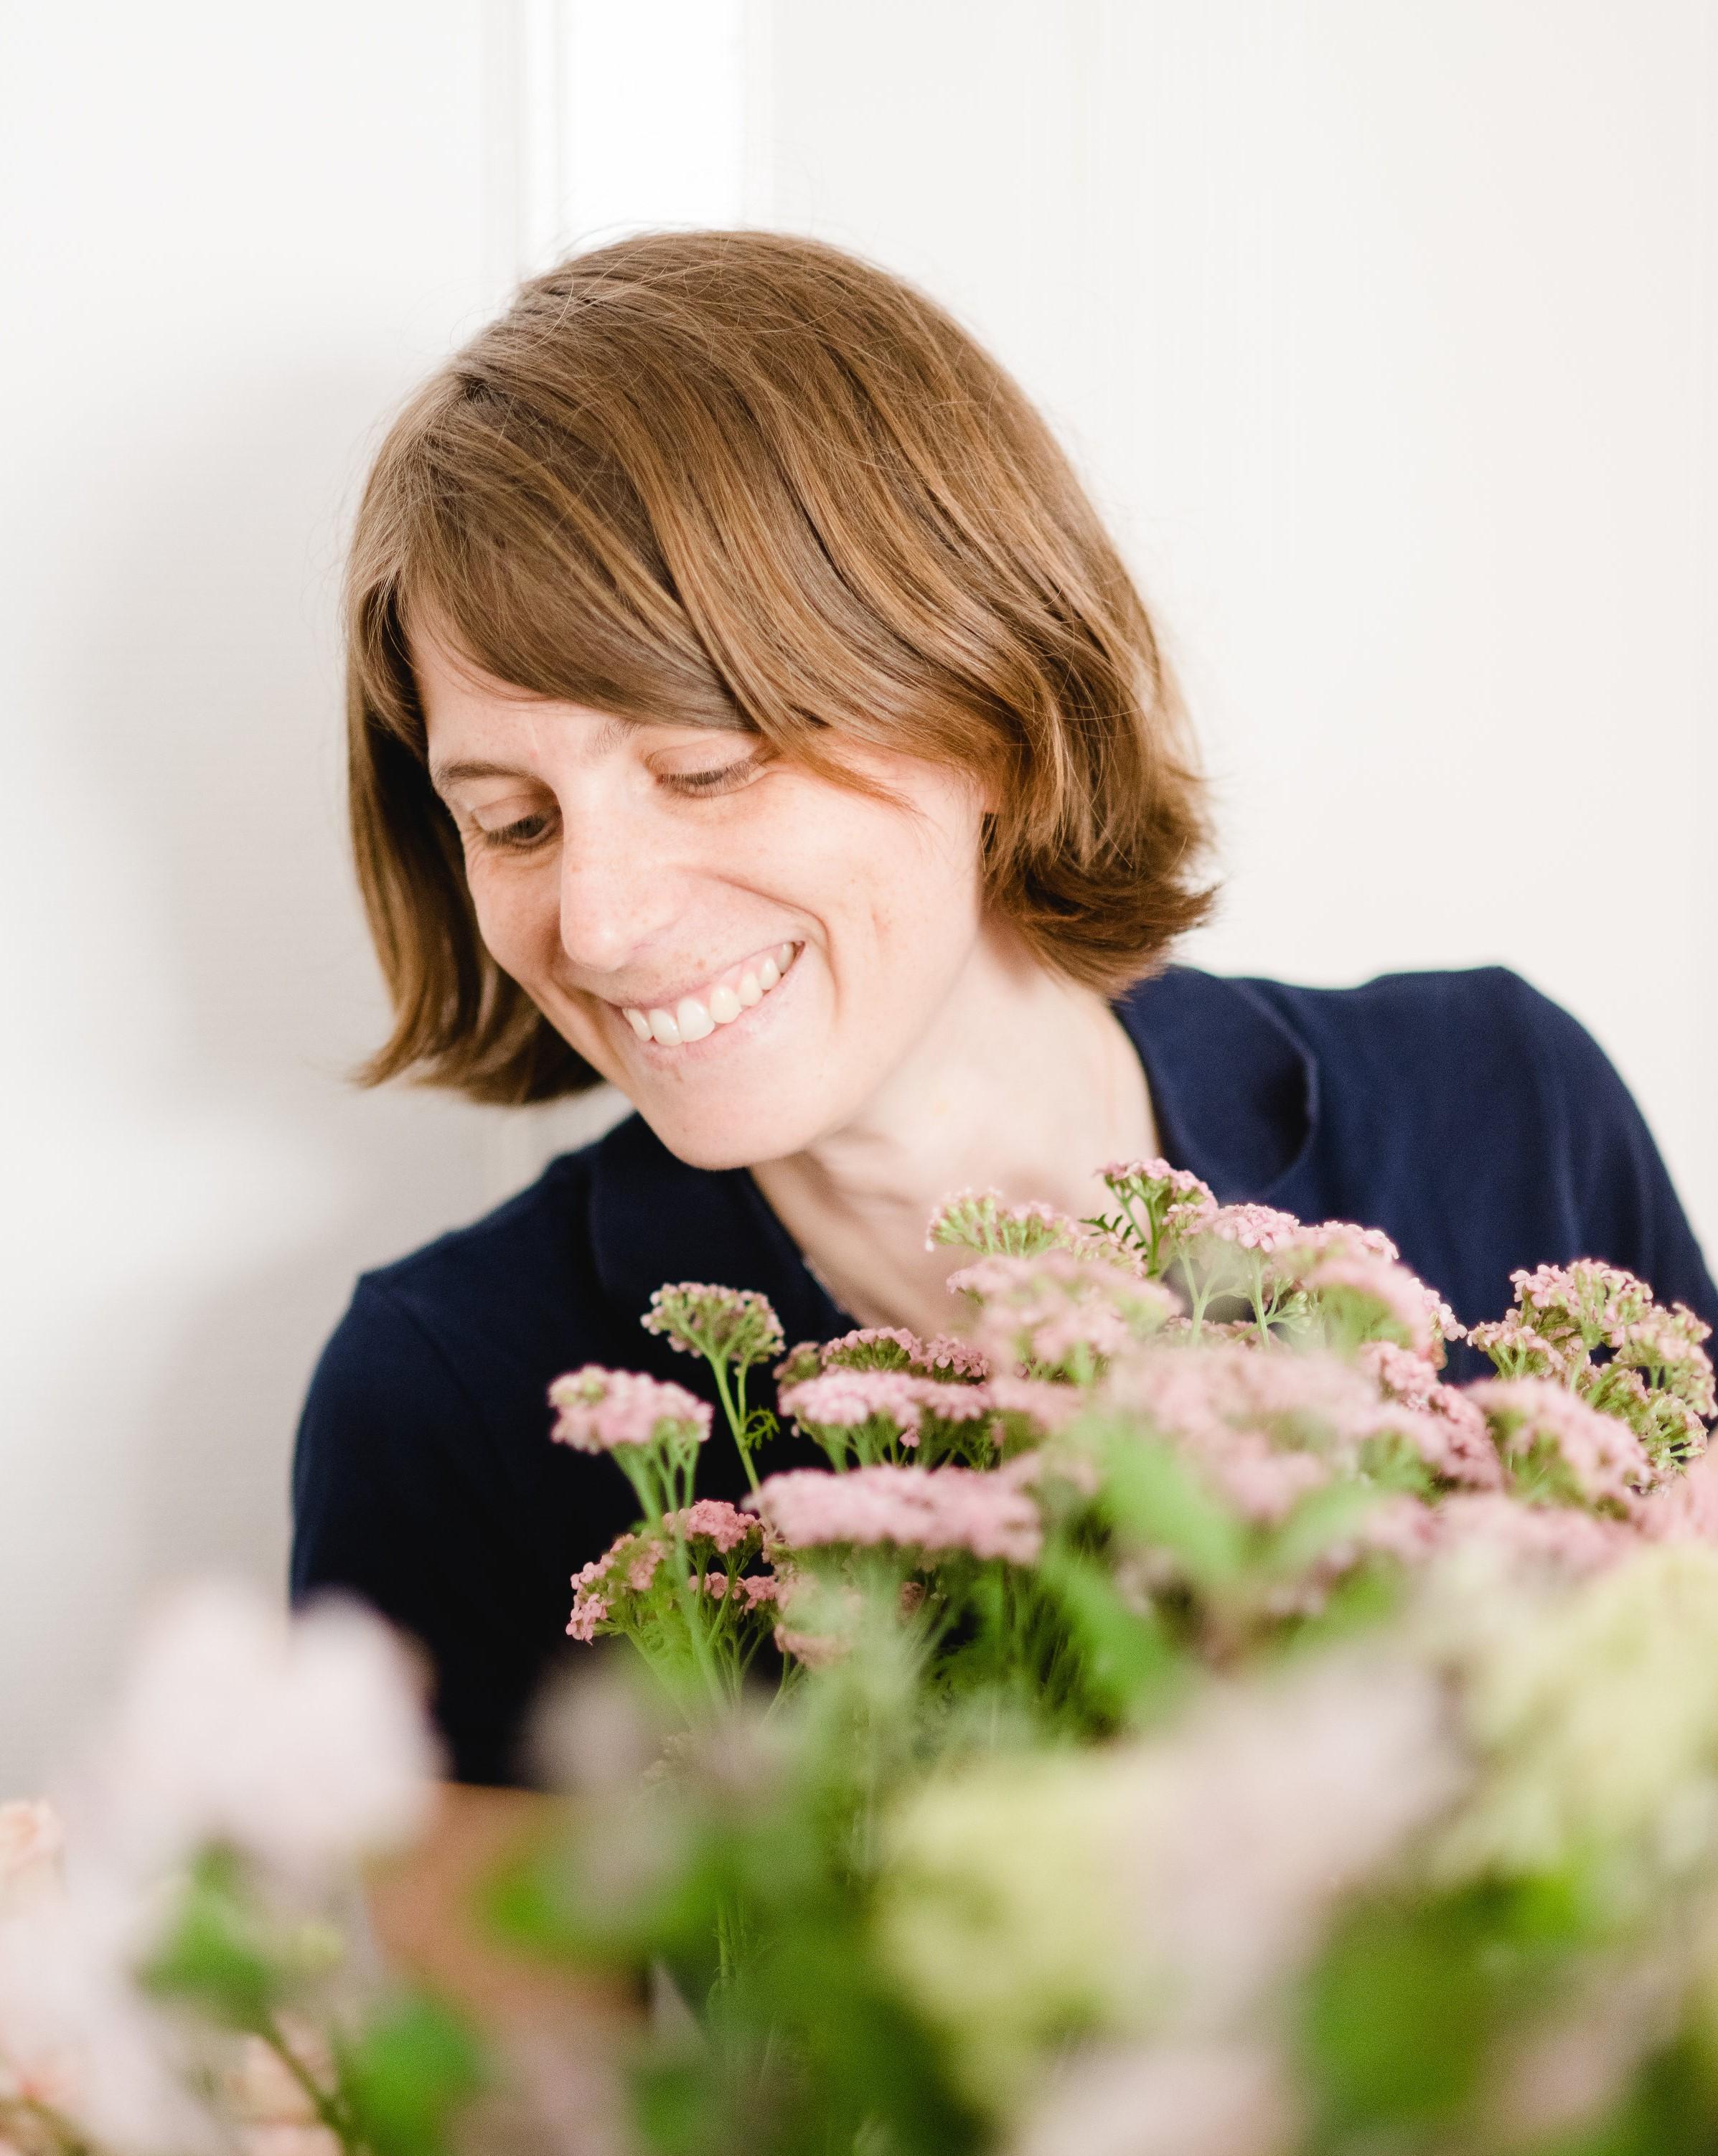 Claire Perignon, floral designer